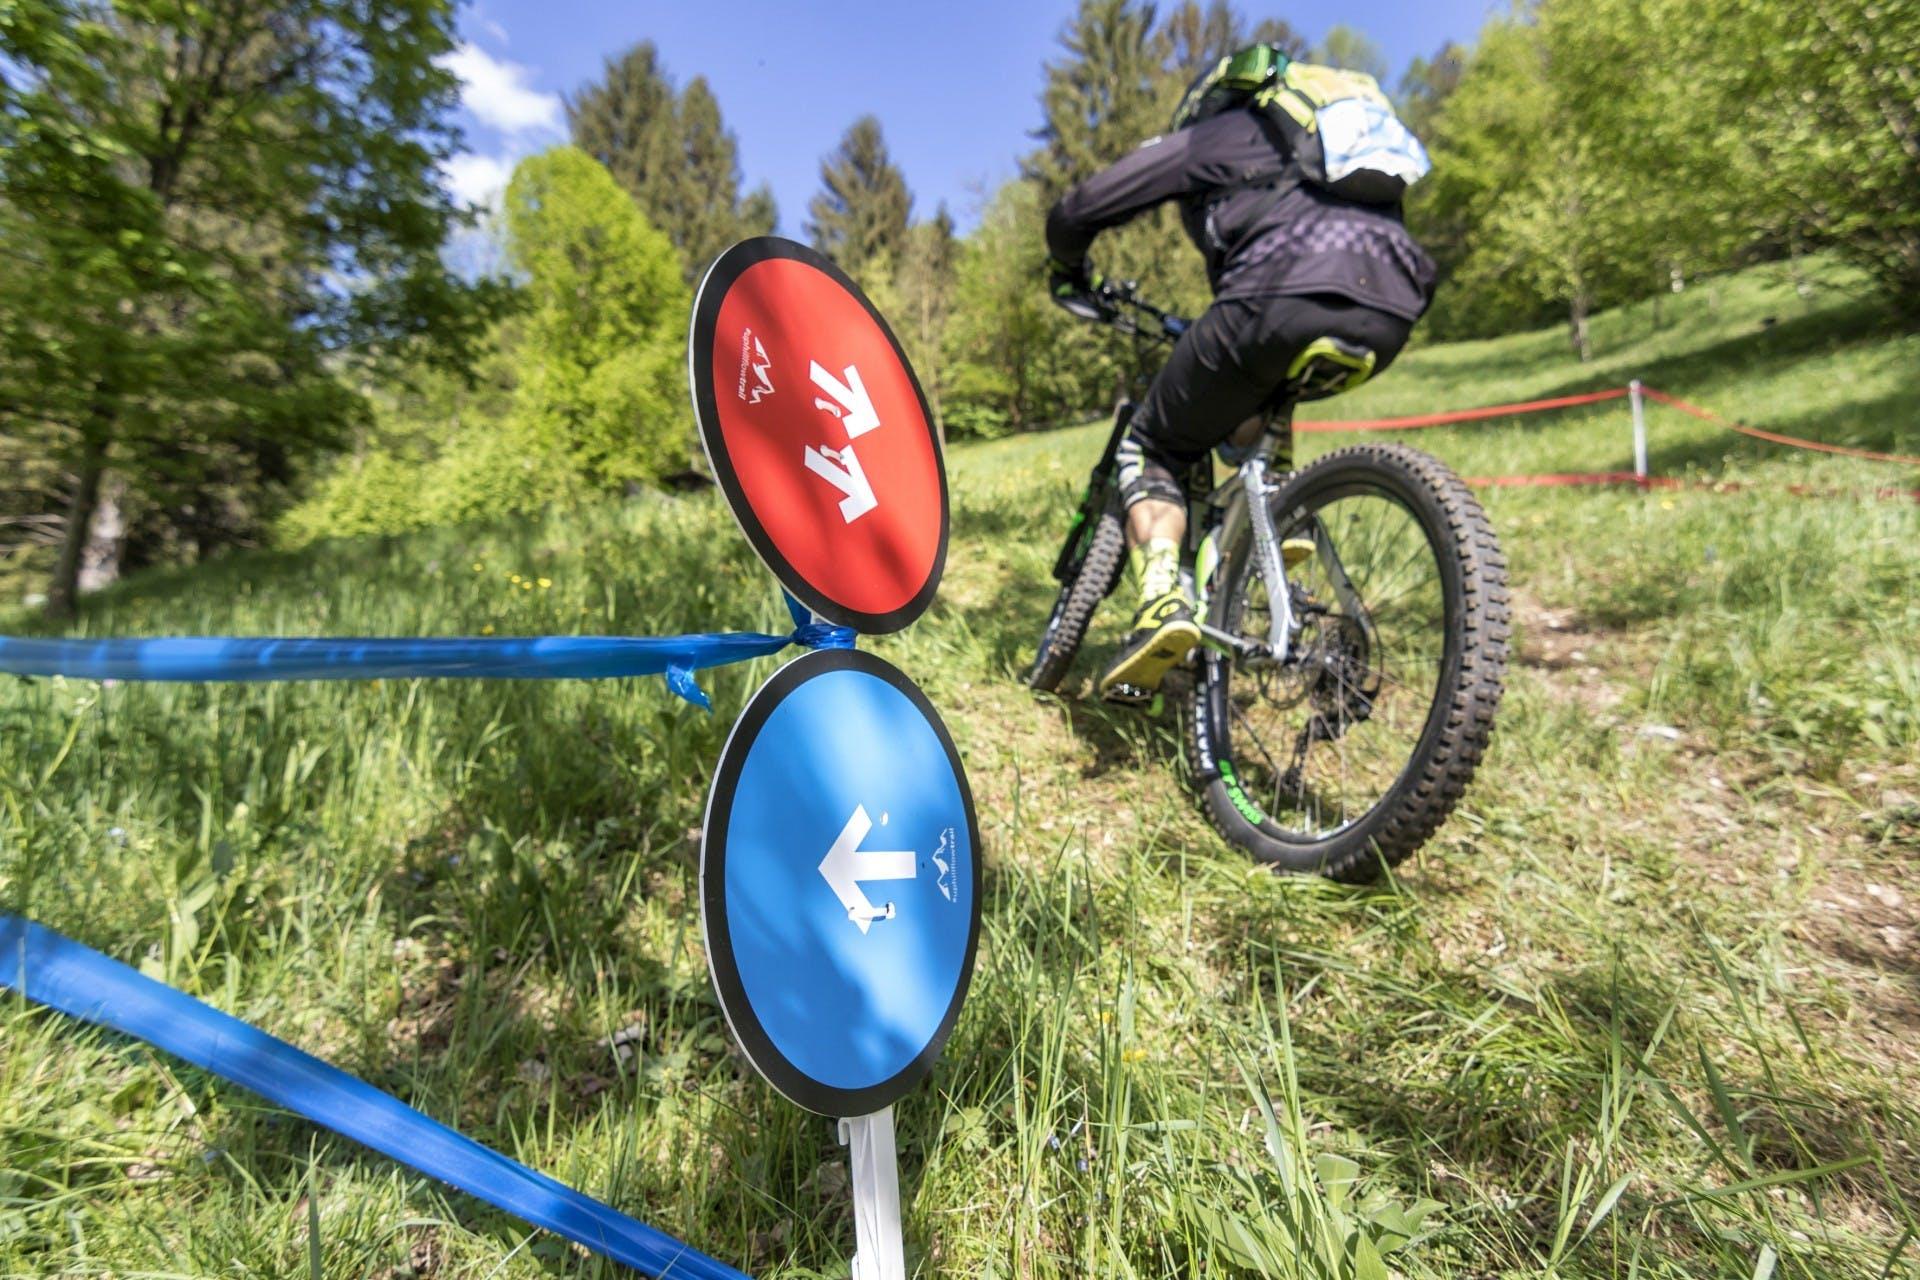 bosch eMtb challenge biker in salita ripida su un prato